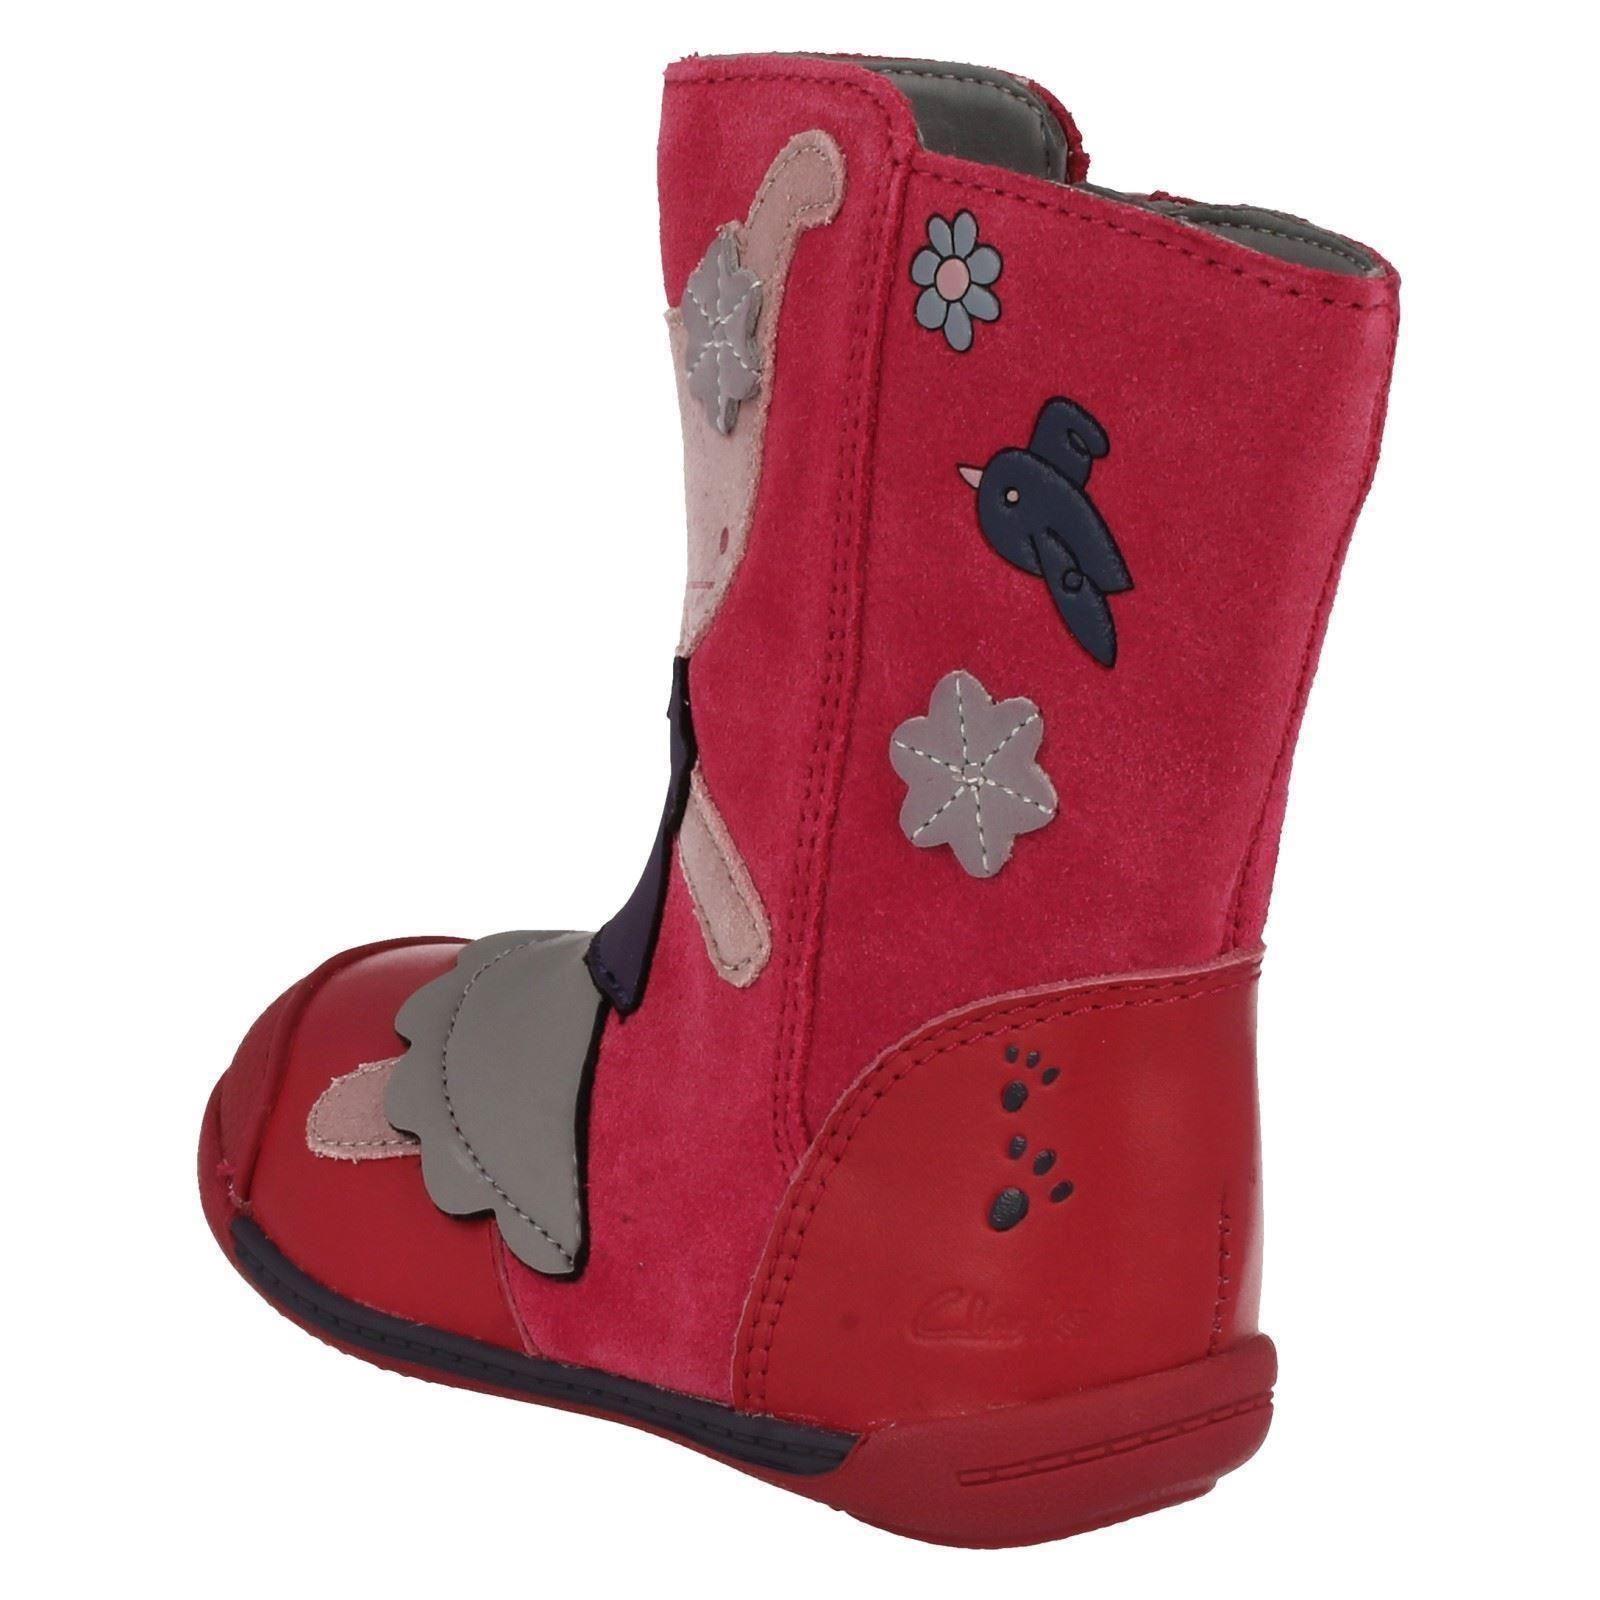 Girls-Clarks-Iva-Friend-Boots-with-Rabbit-Design